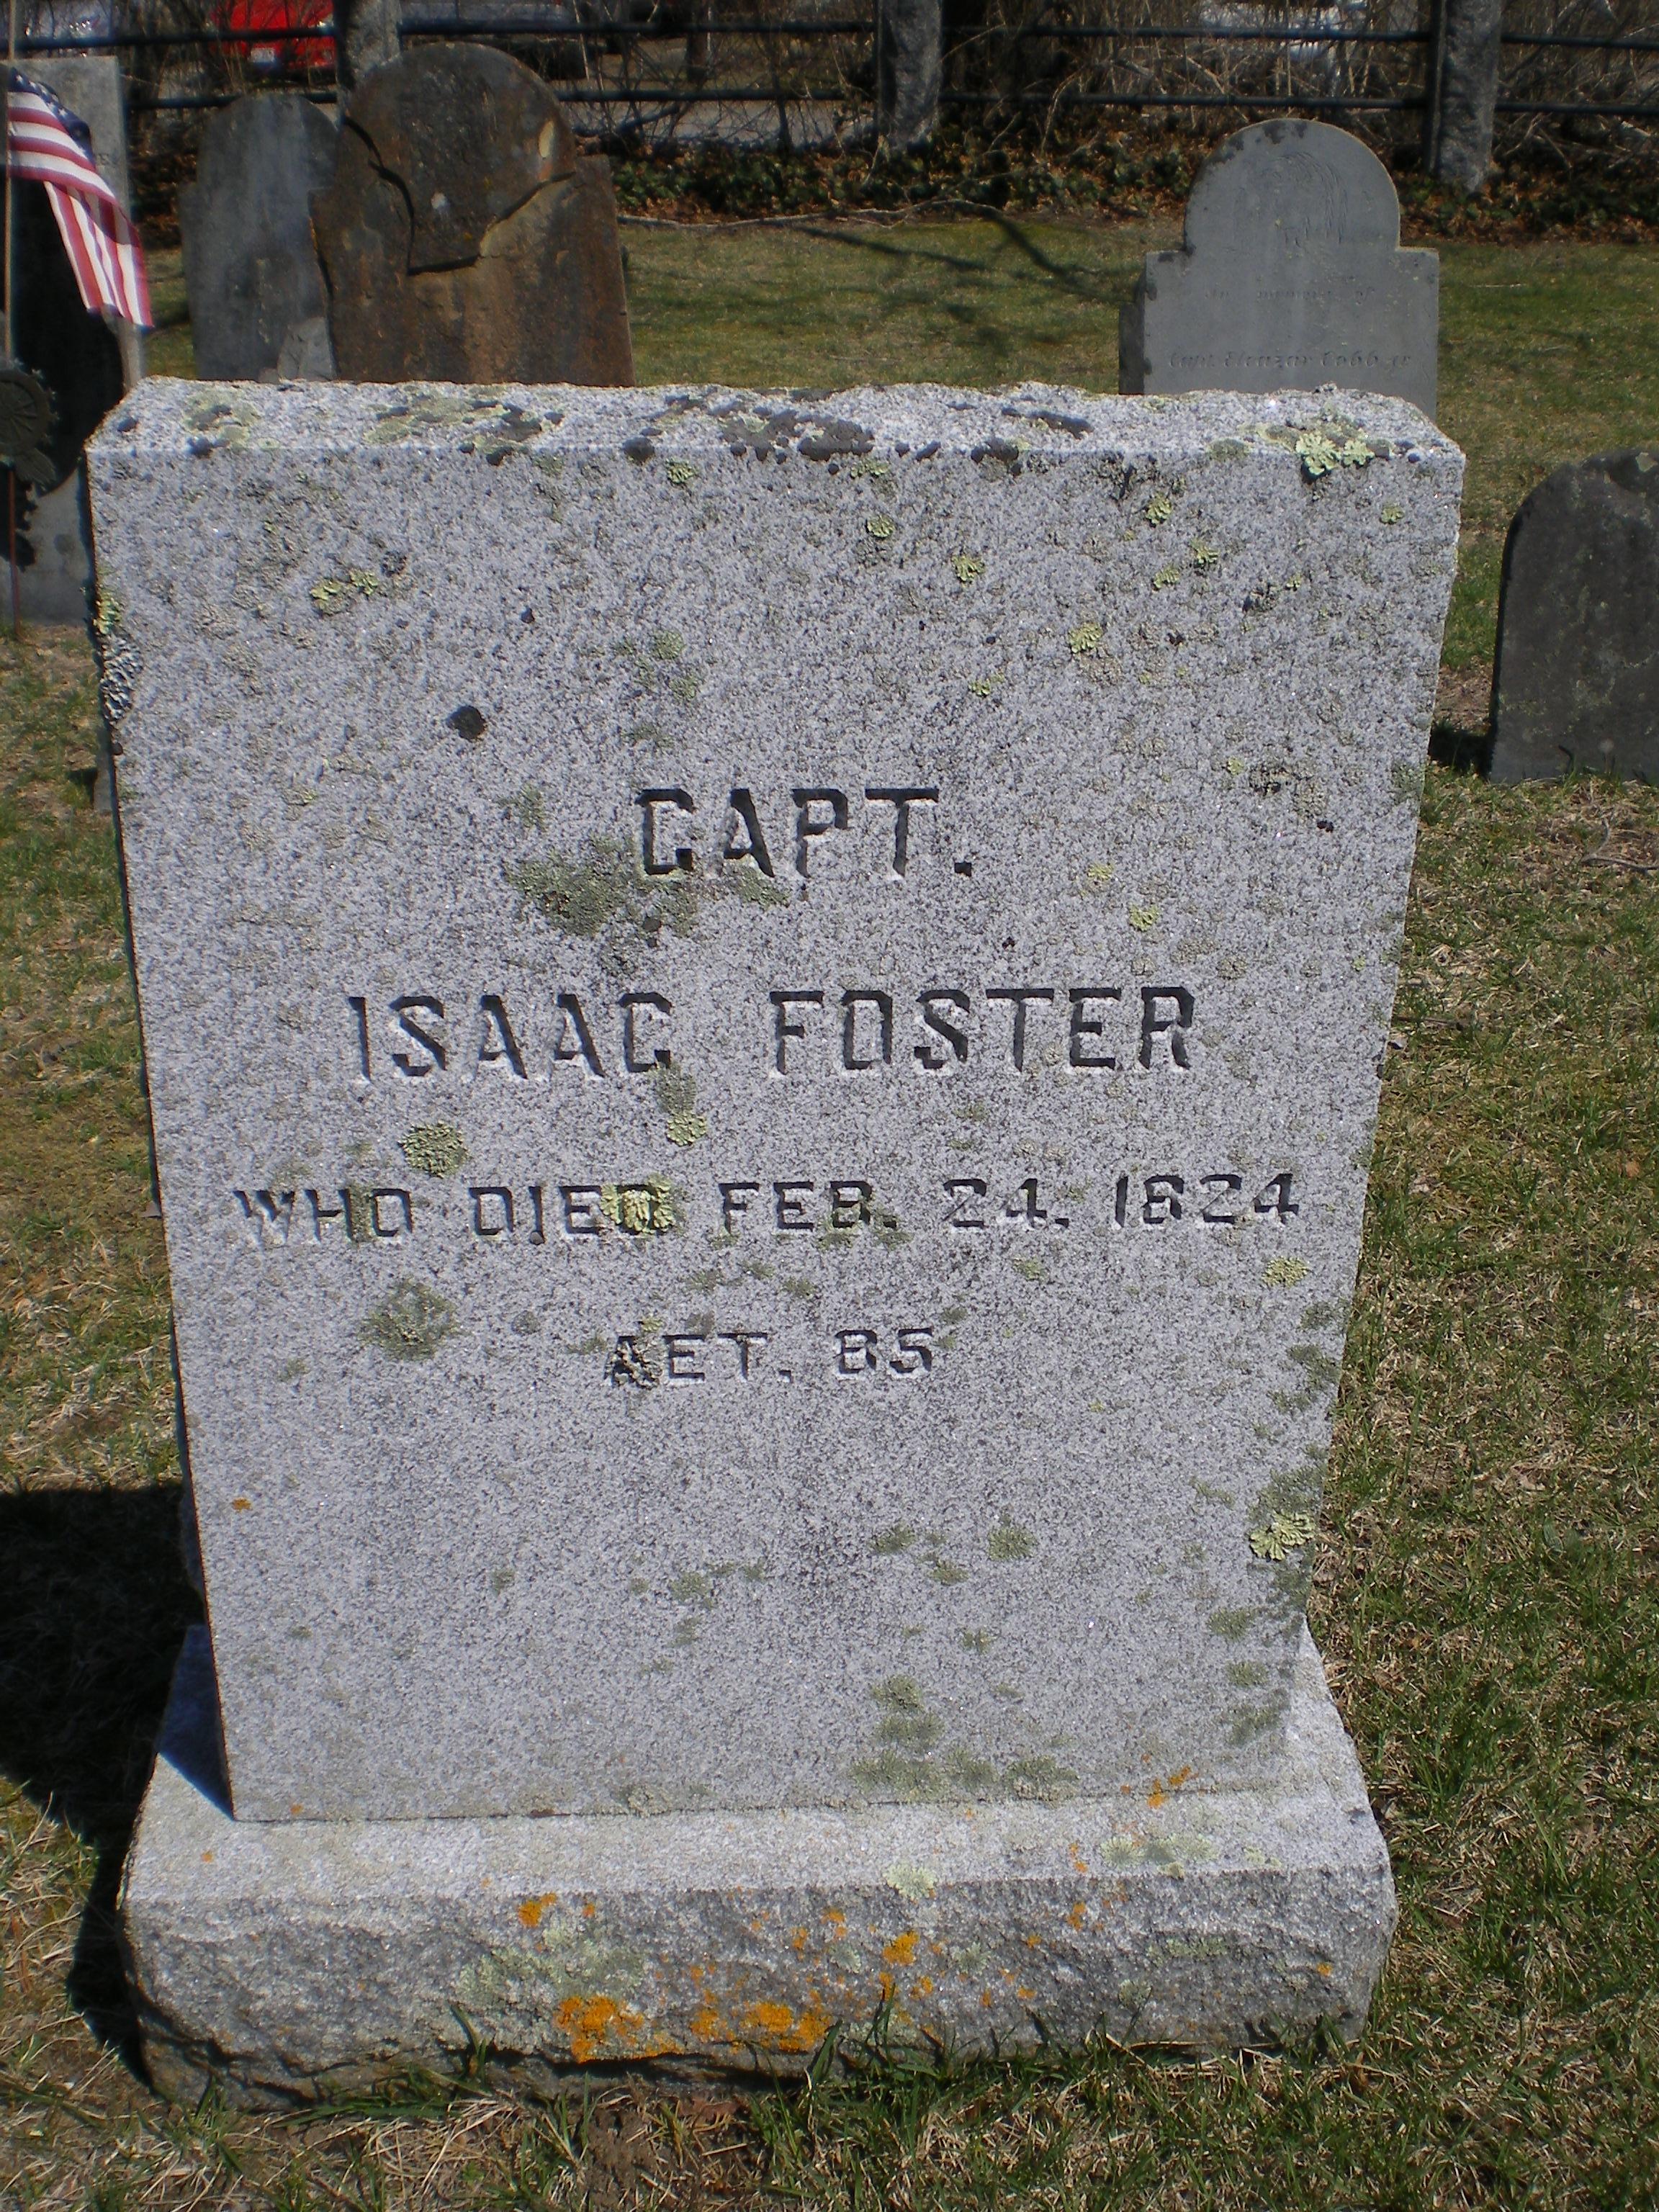 Capt Isaac Foster